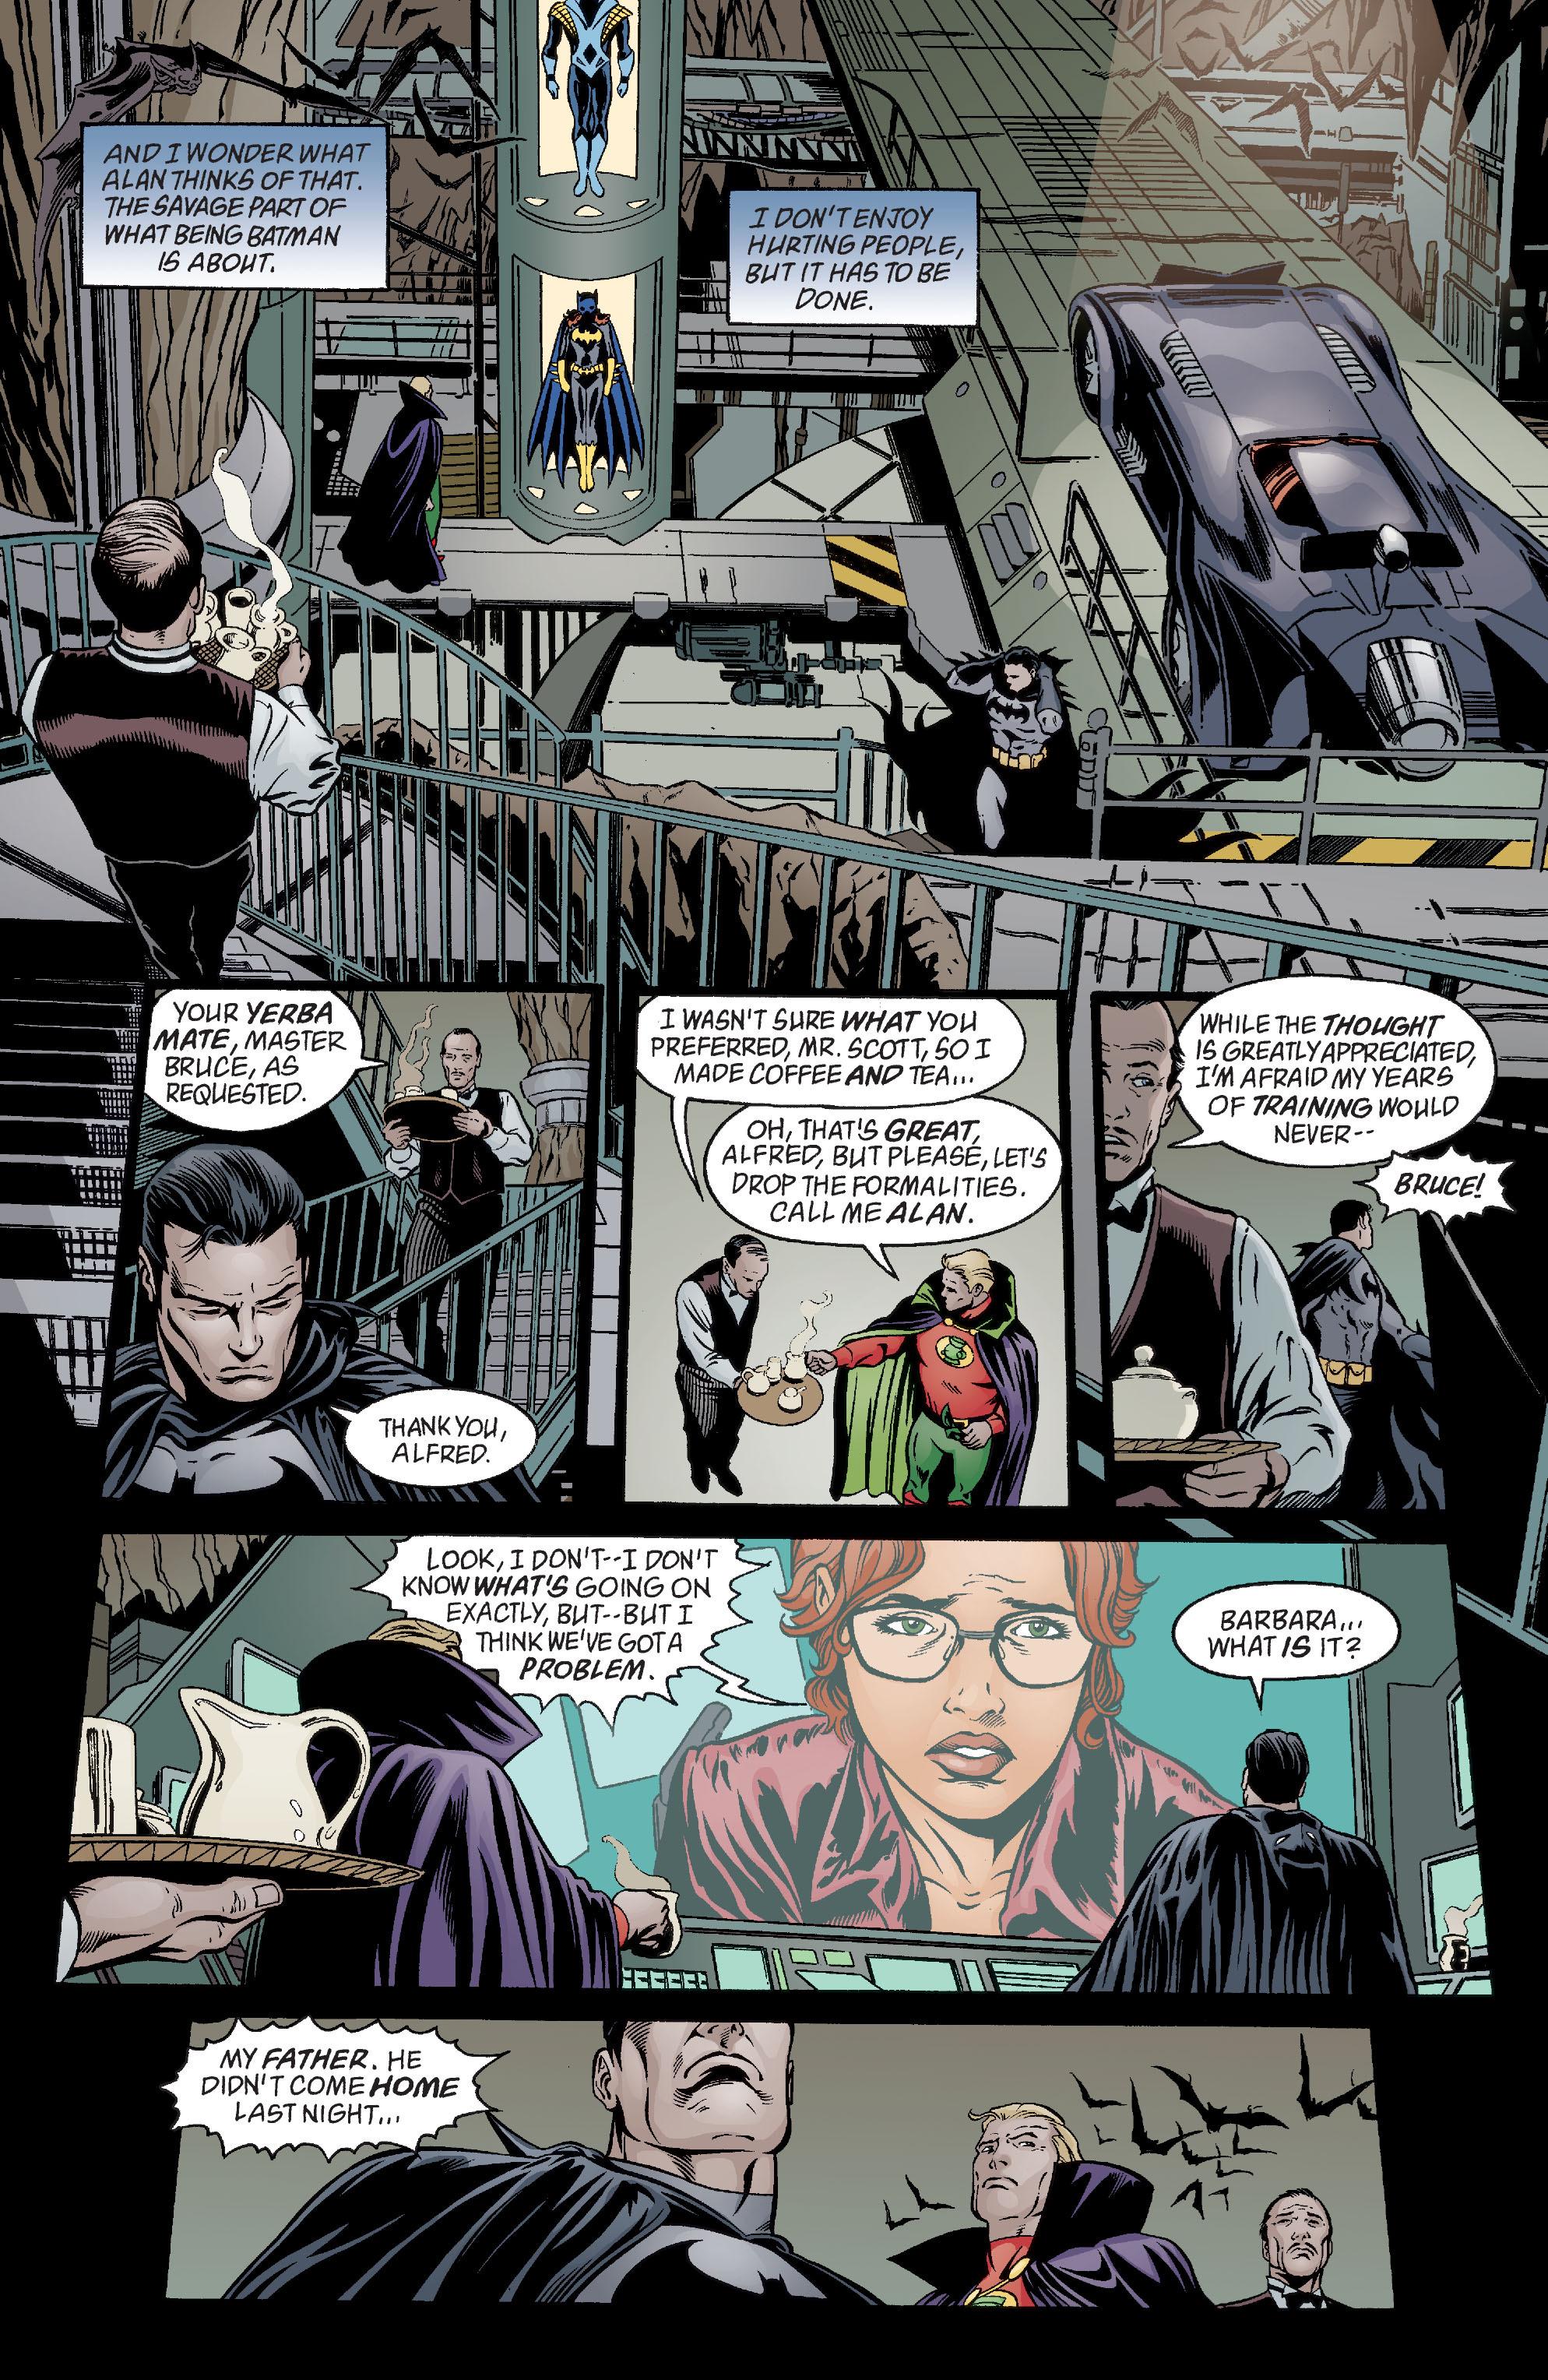 Psychology of Bruce Wayne EiM-p4b_MwDox93UQRtT3FkLh8o5j48eBPeGkOffVUHr5SrR2uFHmAgHrF28UvYiExCwr1JrxU64=s0